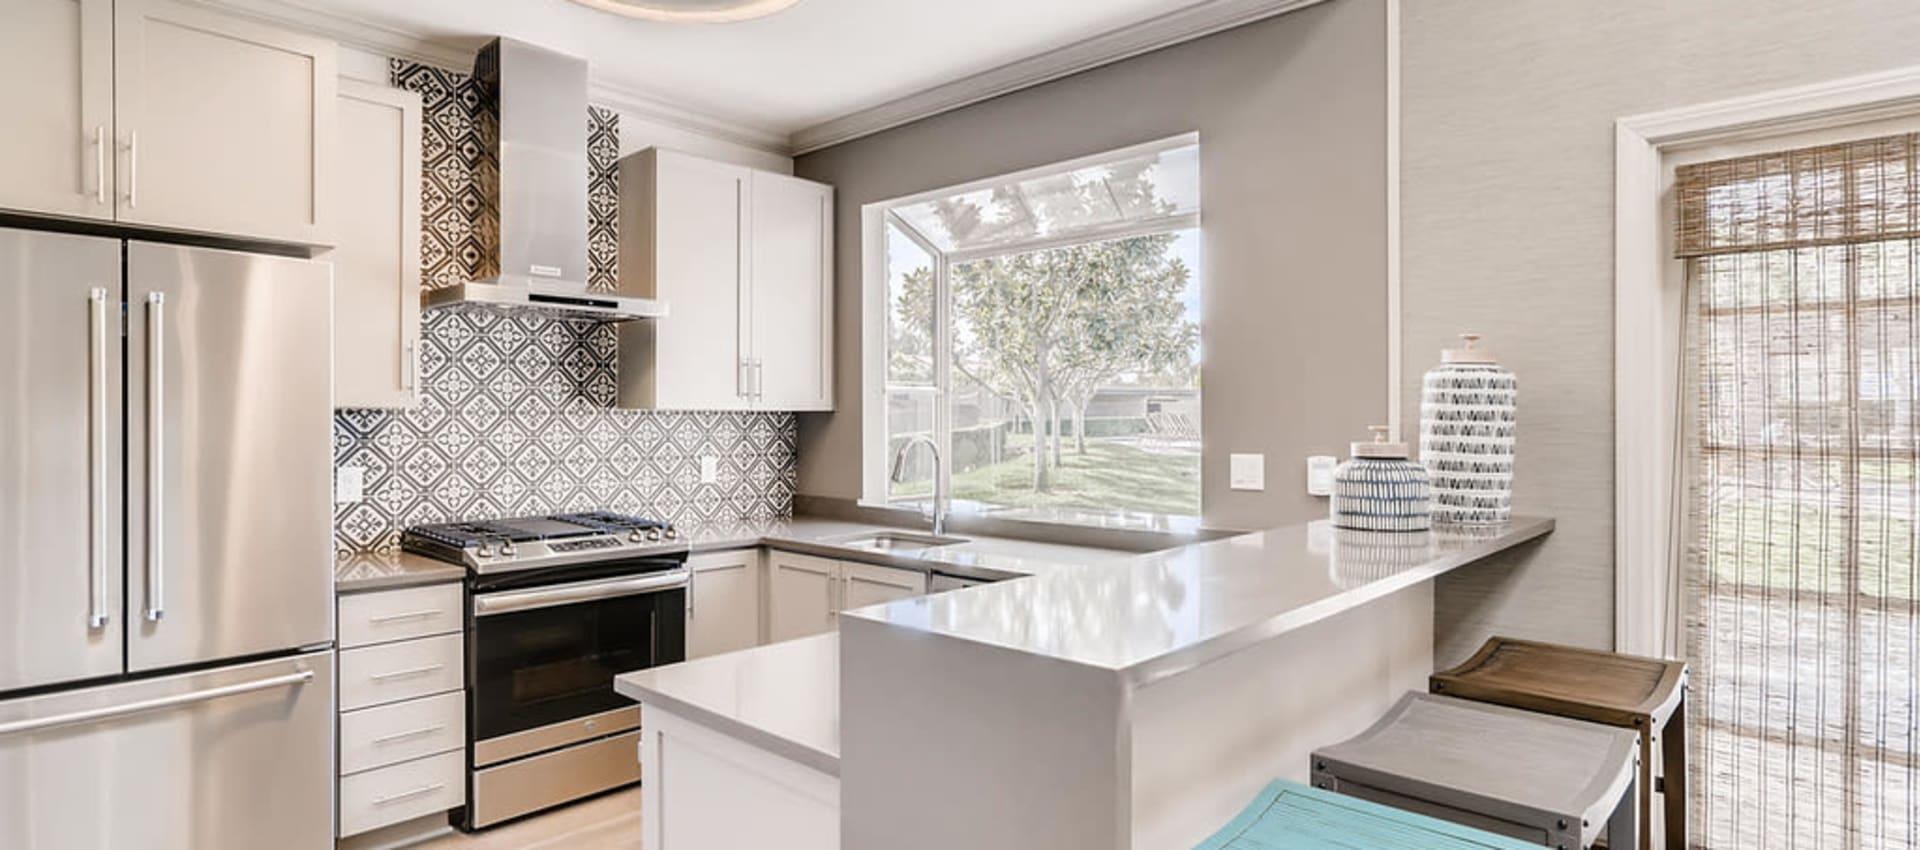 Kitchen at Hidden Hills Condominium Rentals in Laguna Niguel, California